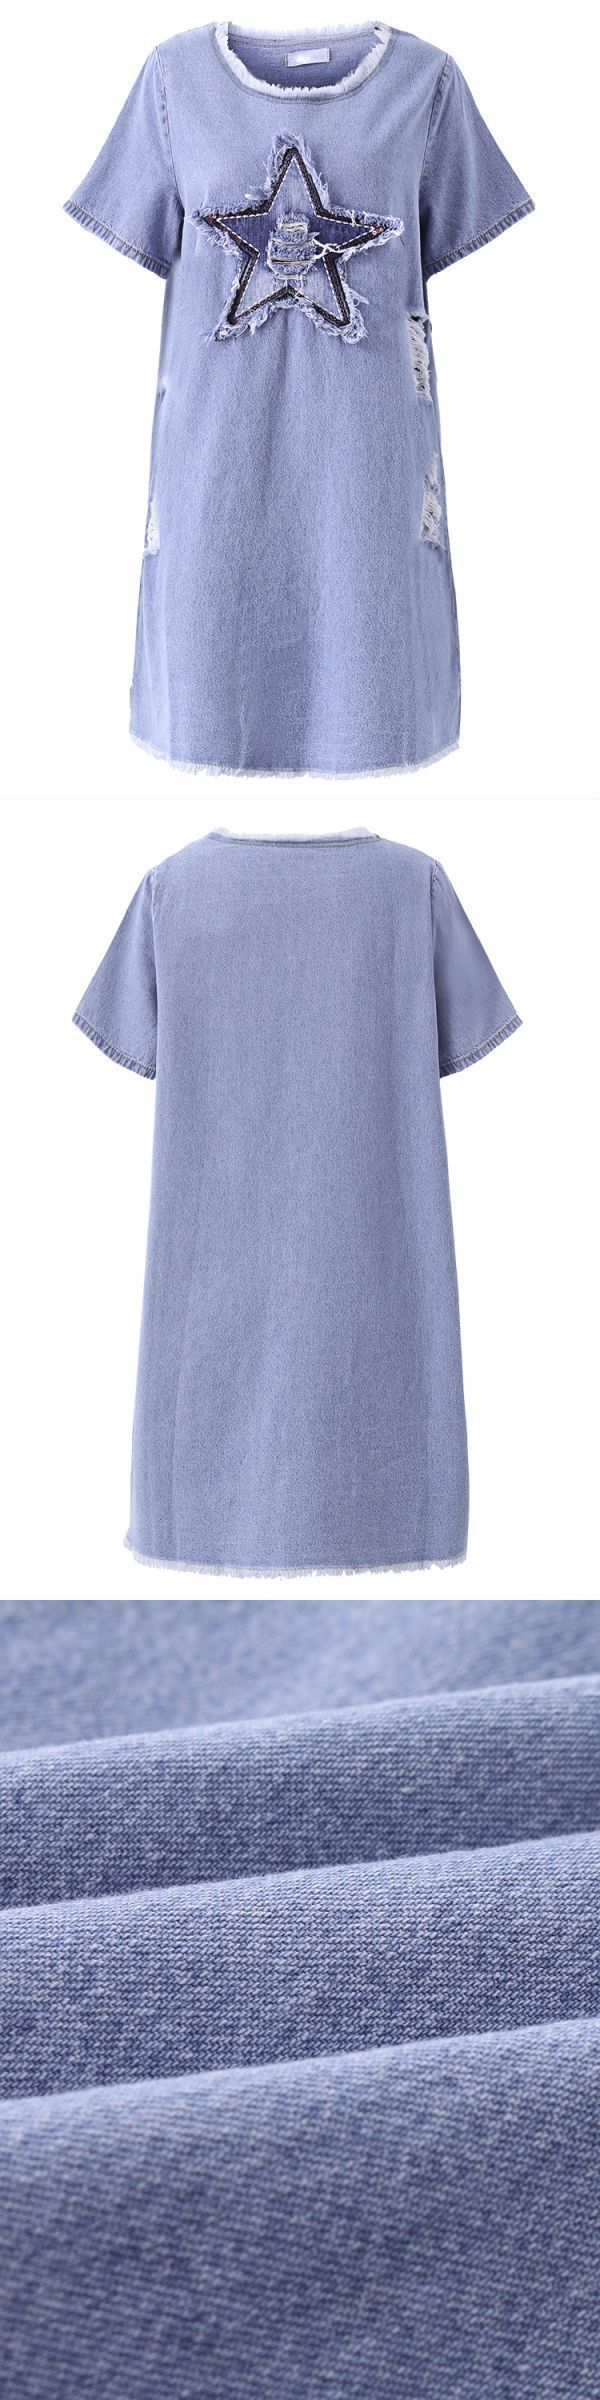 Blue casual short sleeve five-pointed star pattern ripped denim mini dress chiffon dresses coral #2 #piece #chiffon #dresses #chiffon #dress #victorian #chiffon #dresses #boutique #chiffon #dresses #melbourne